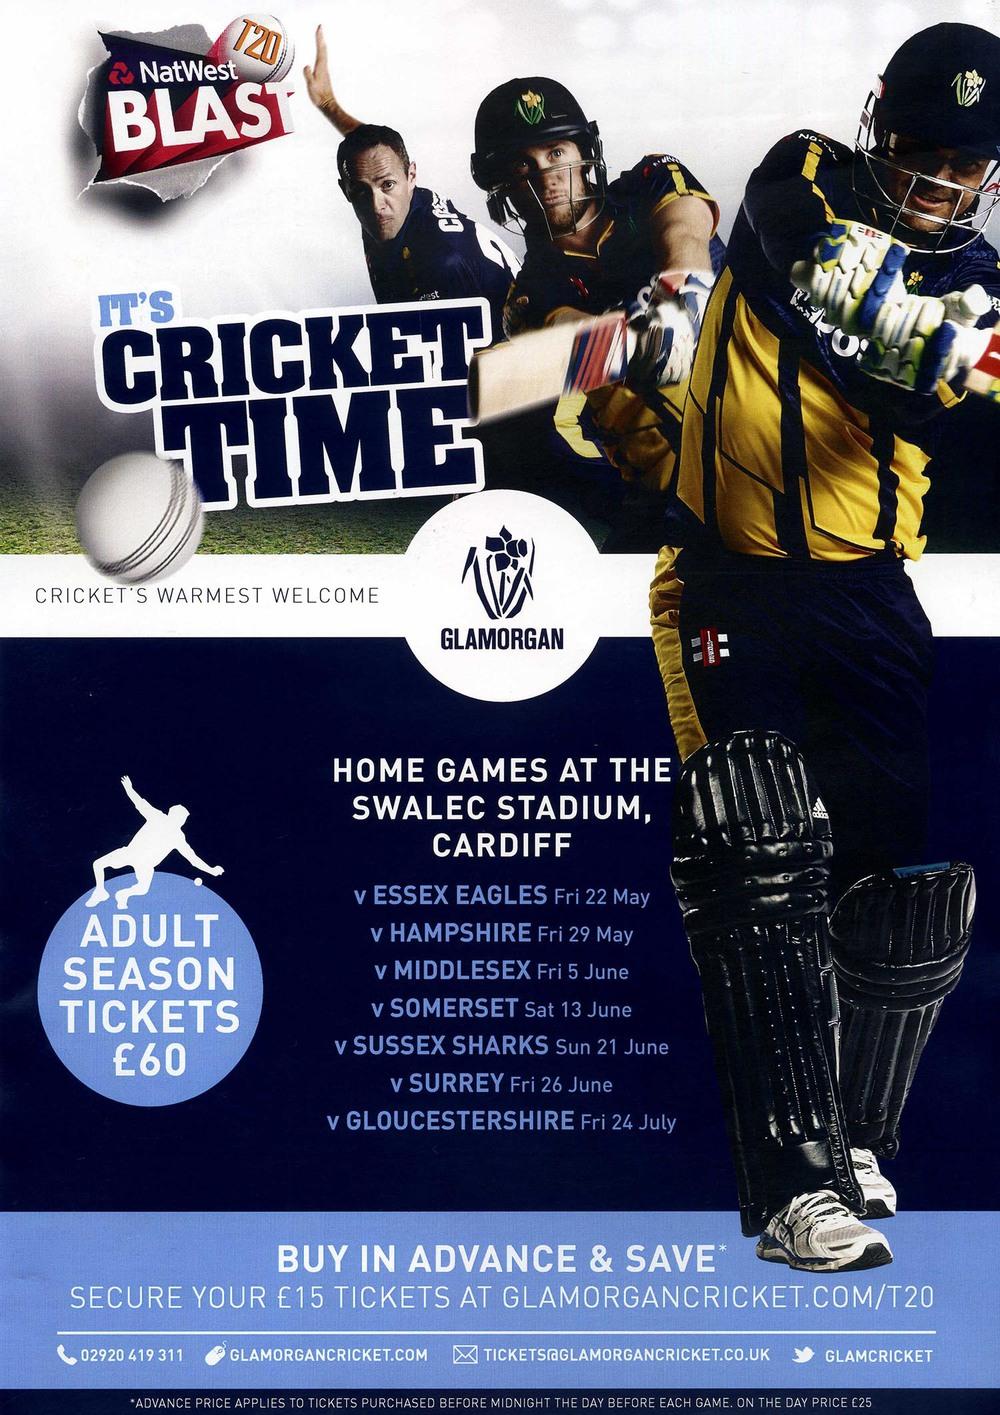 Glamorgan NatWest T20 Blast advert